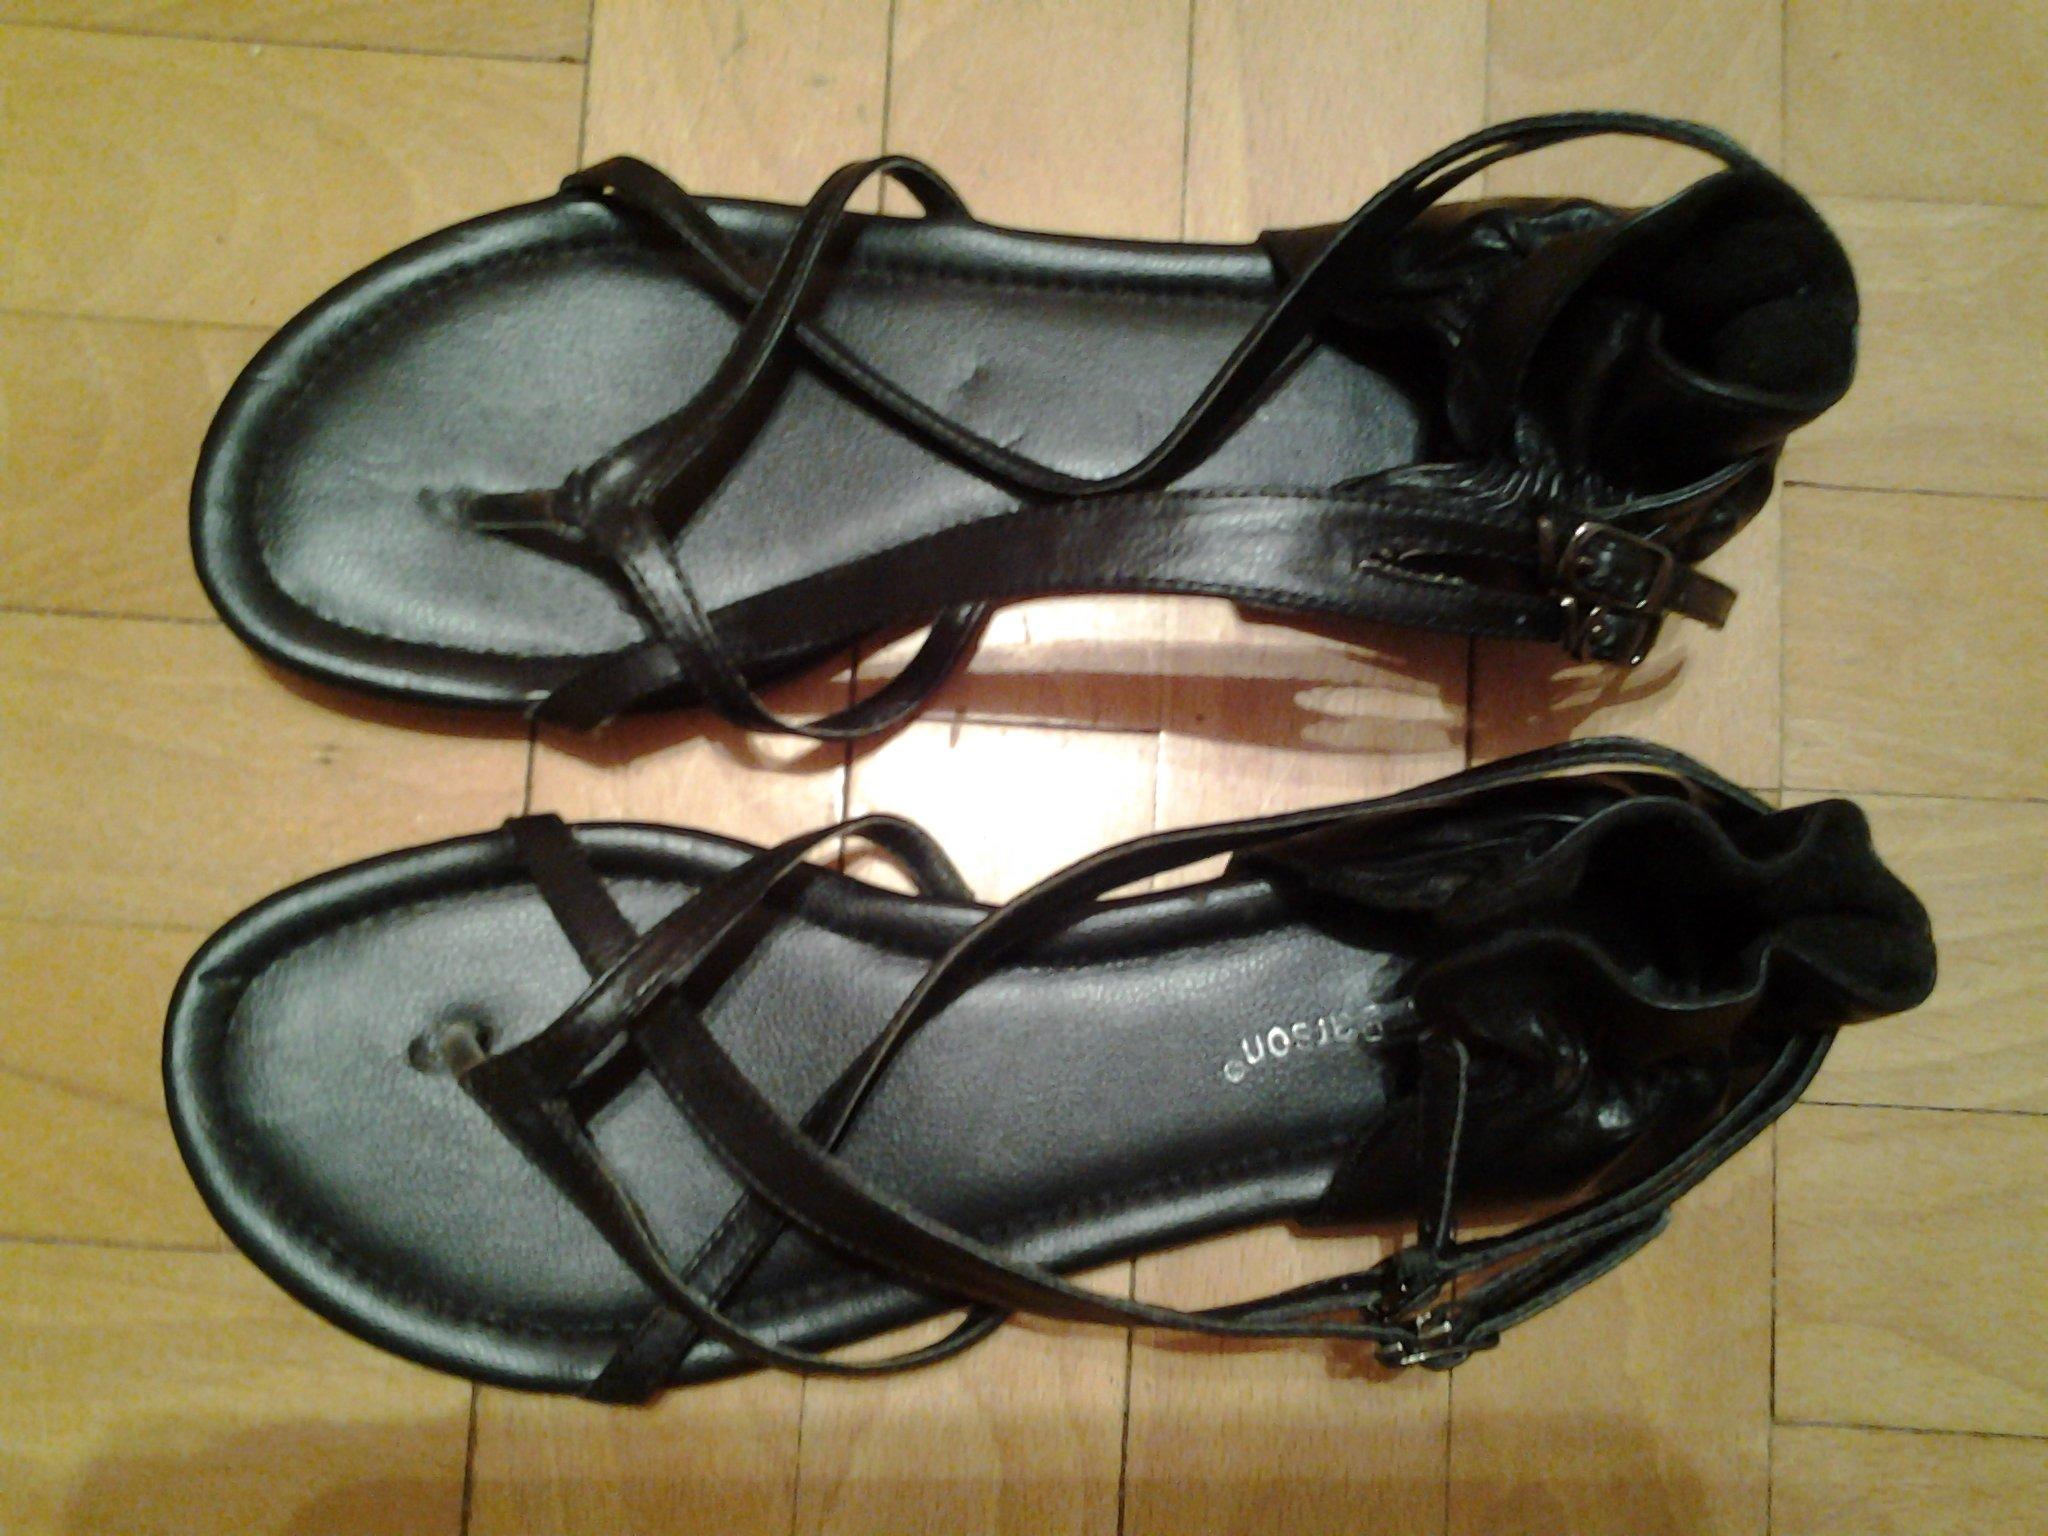 e22f8375b93b5 CCC Clara Barson płaskie sandały paski japonki - 7331443408 ...